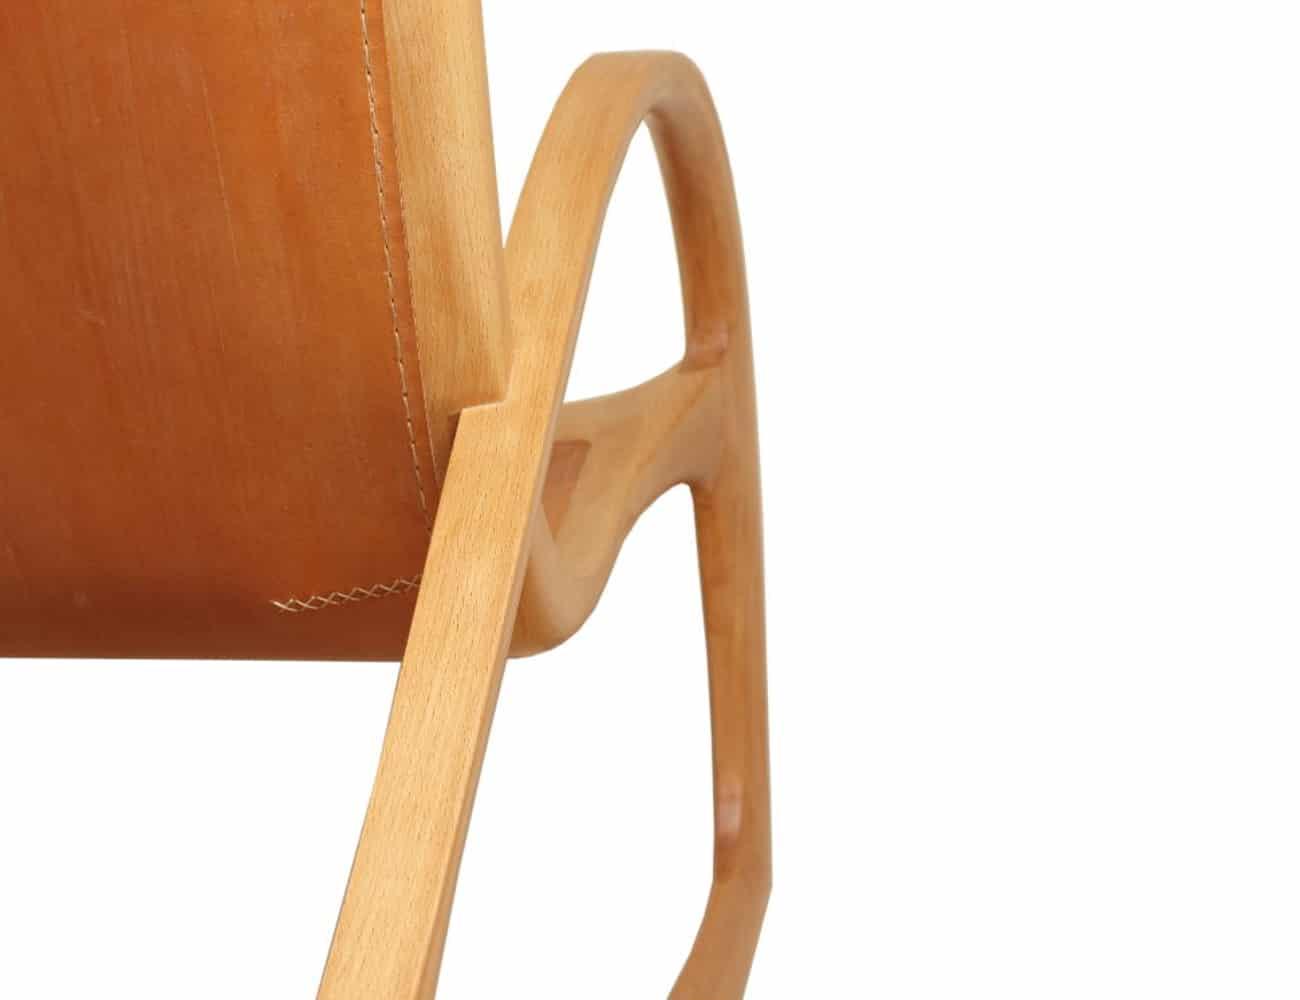 Holzart Buche mit hellbraunem Leder und heller Naht